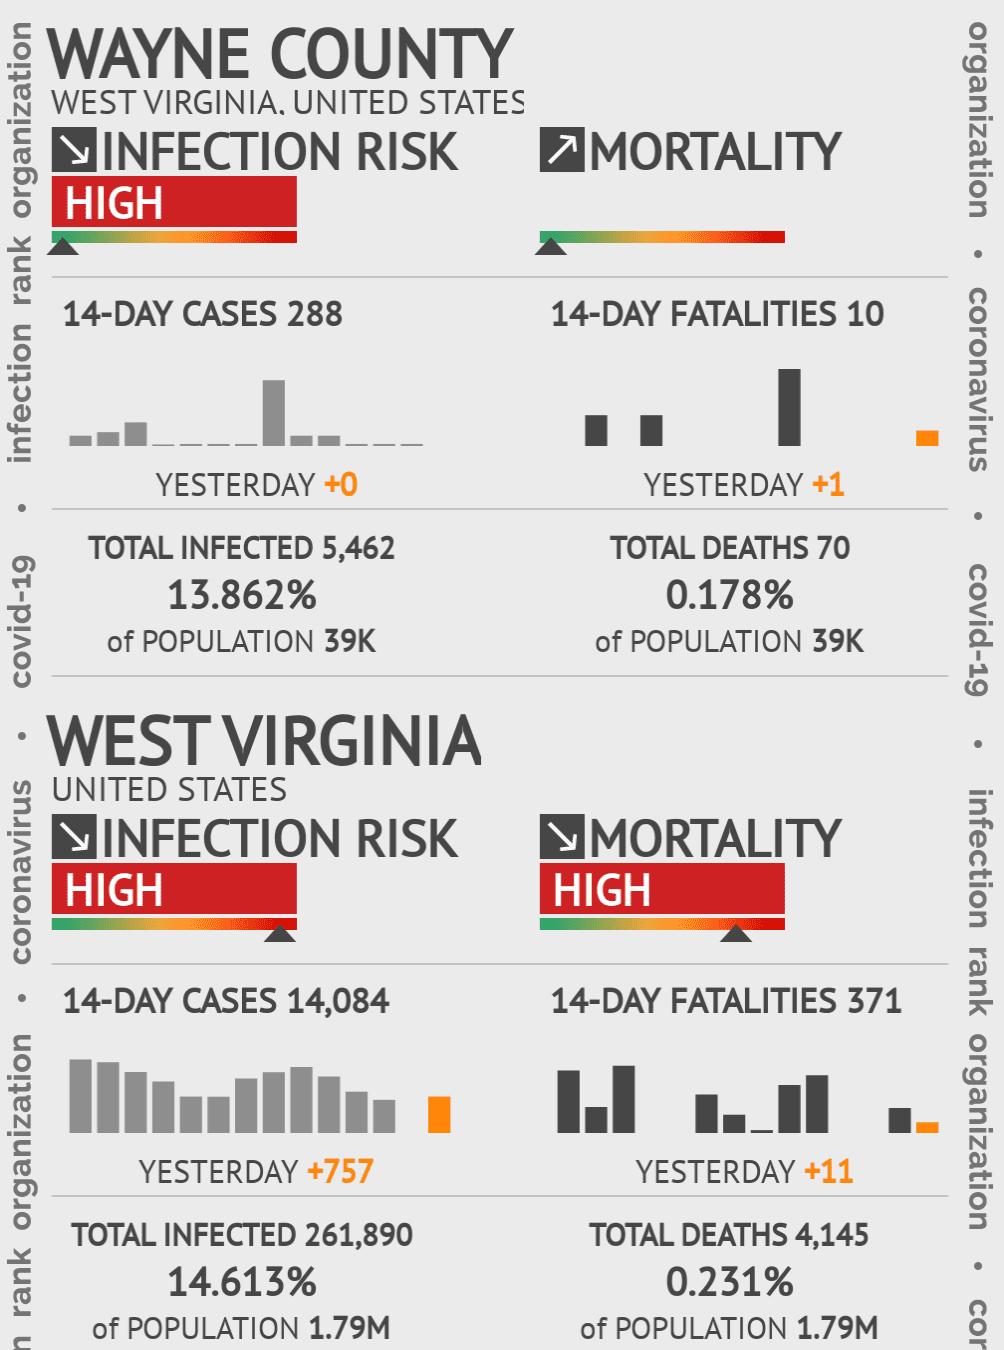 Wayne County Coronavirus Covid-19 Risk of Infection on March 23, 2021